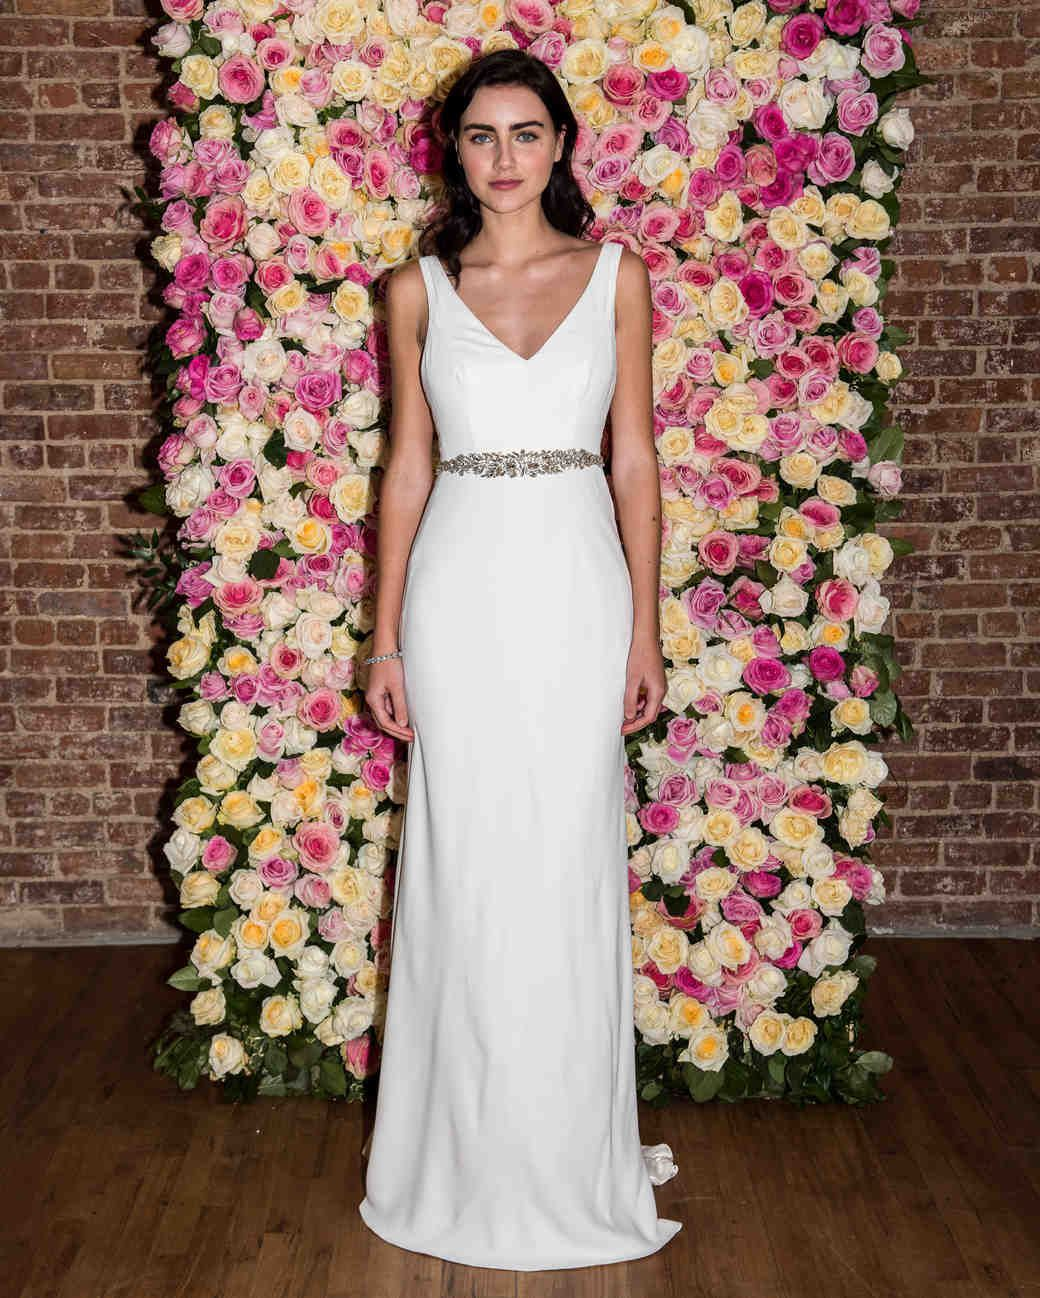 20+ Alexis Bledel Wedding Dress - Wedding Dresses for Cheap Check ...